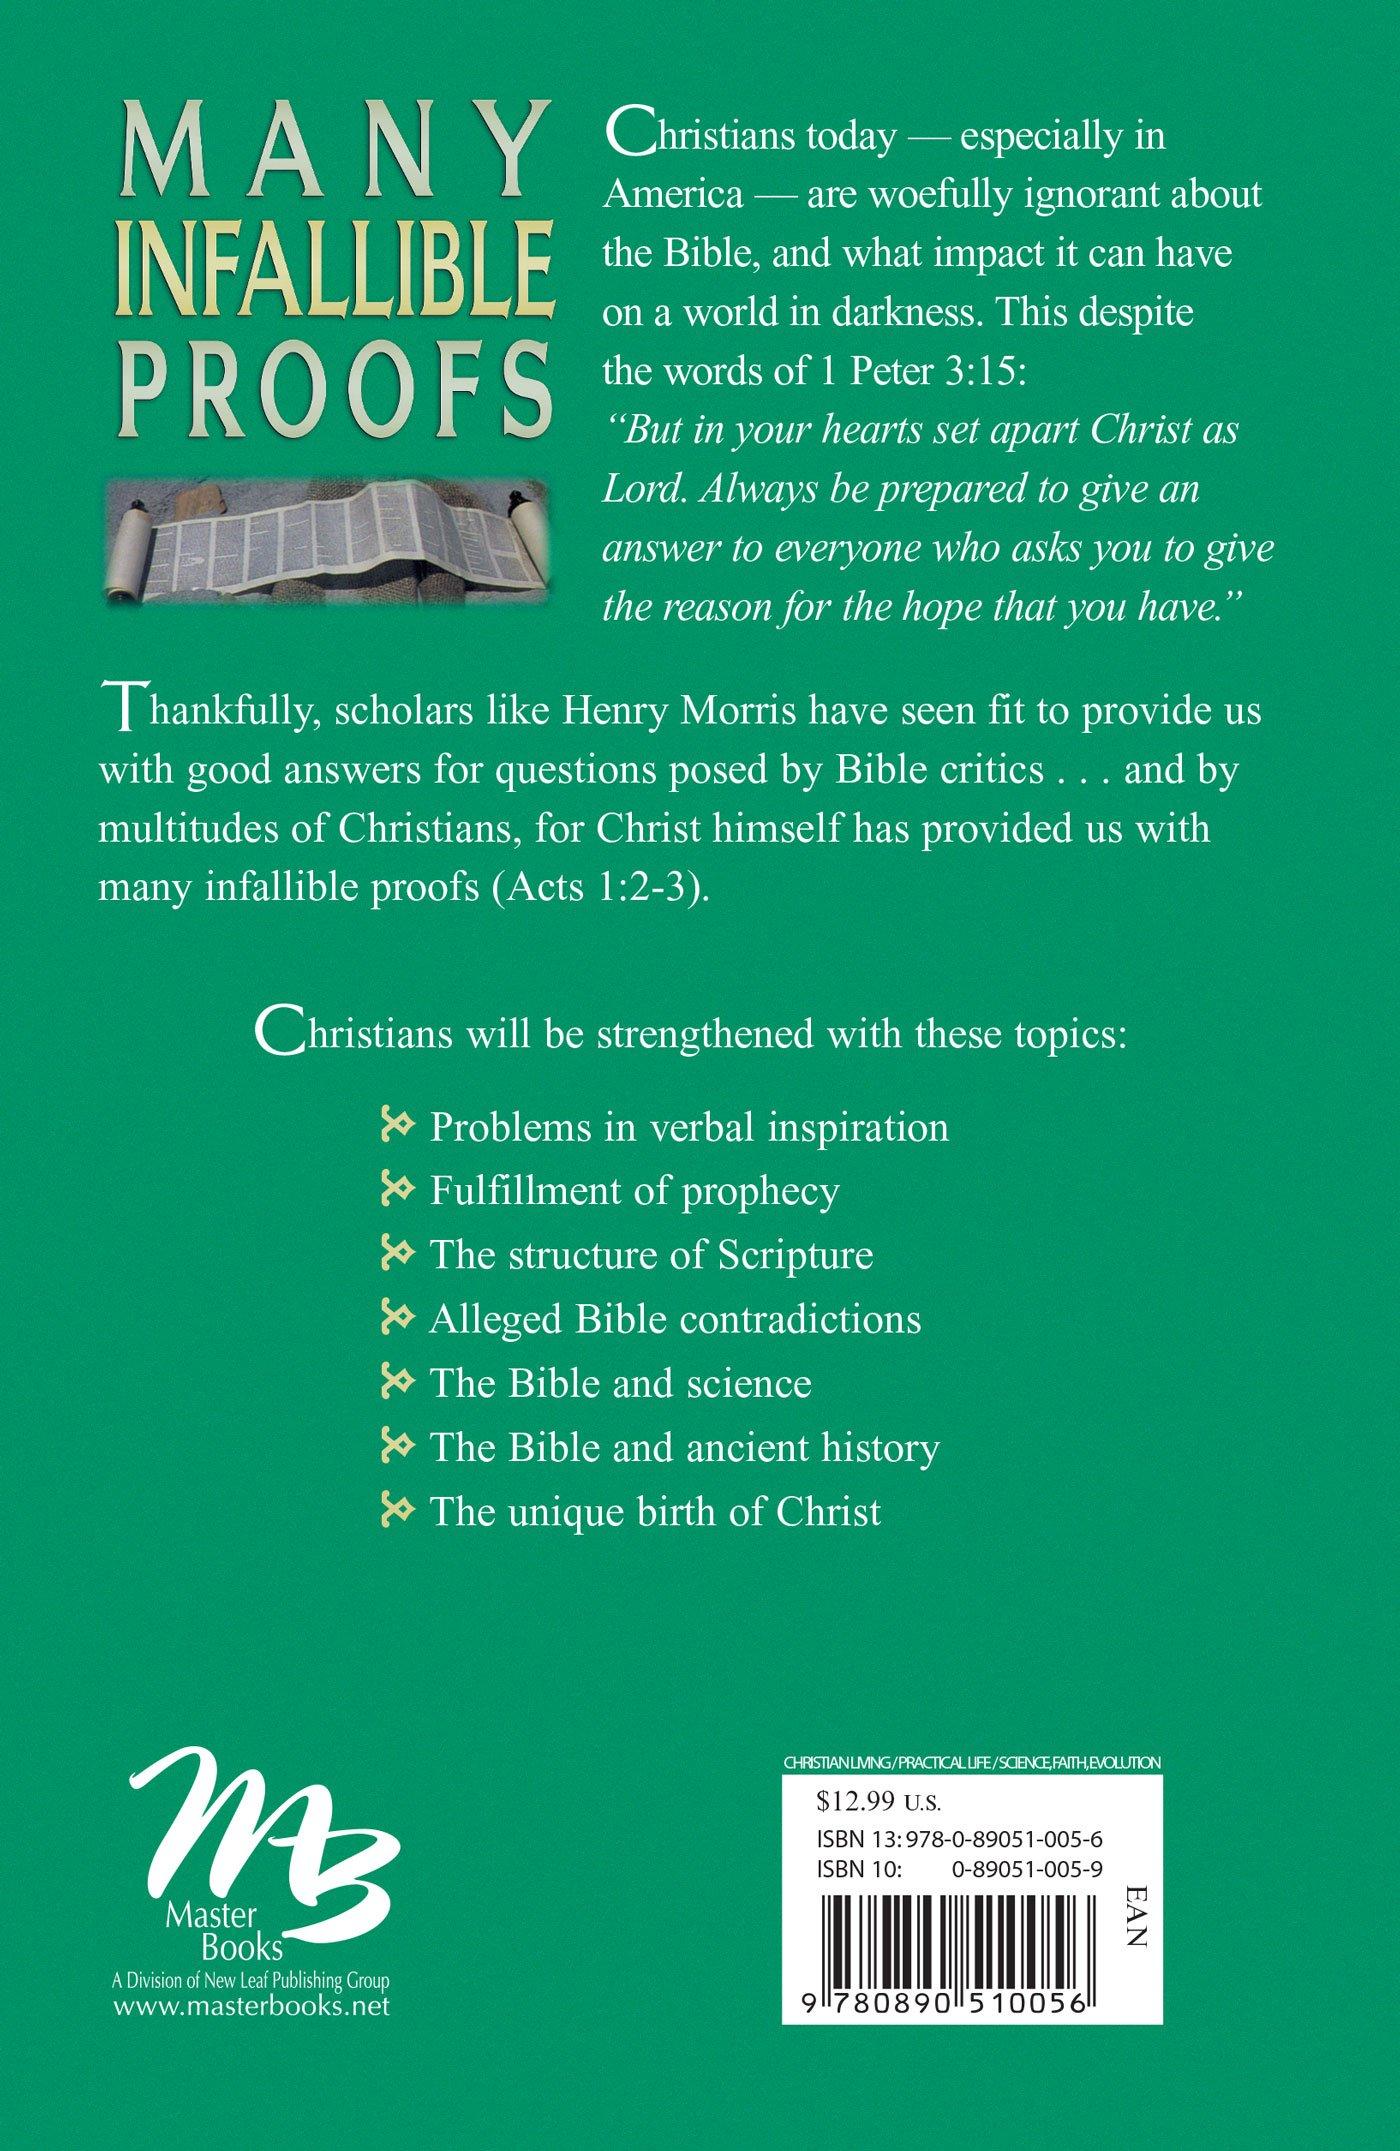 Many Infallible Proofs: Evidences for the Christian Faith: Henry M. Morris,  Henry M. Morris III: 9780890510056: Amazon.com: Books